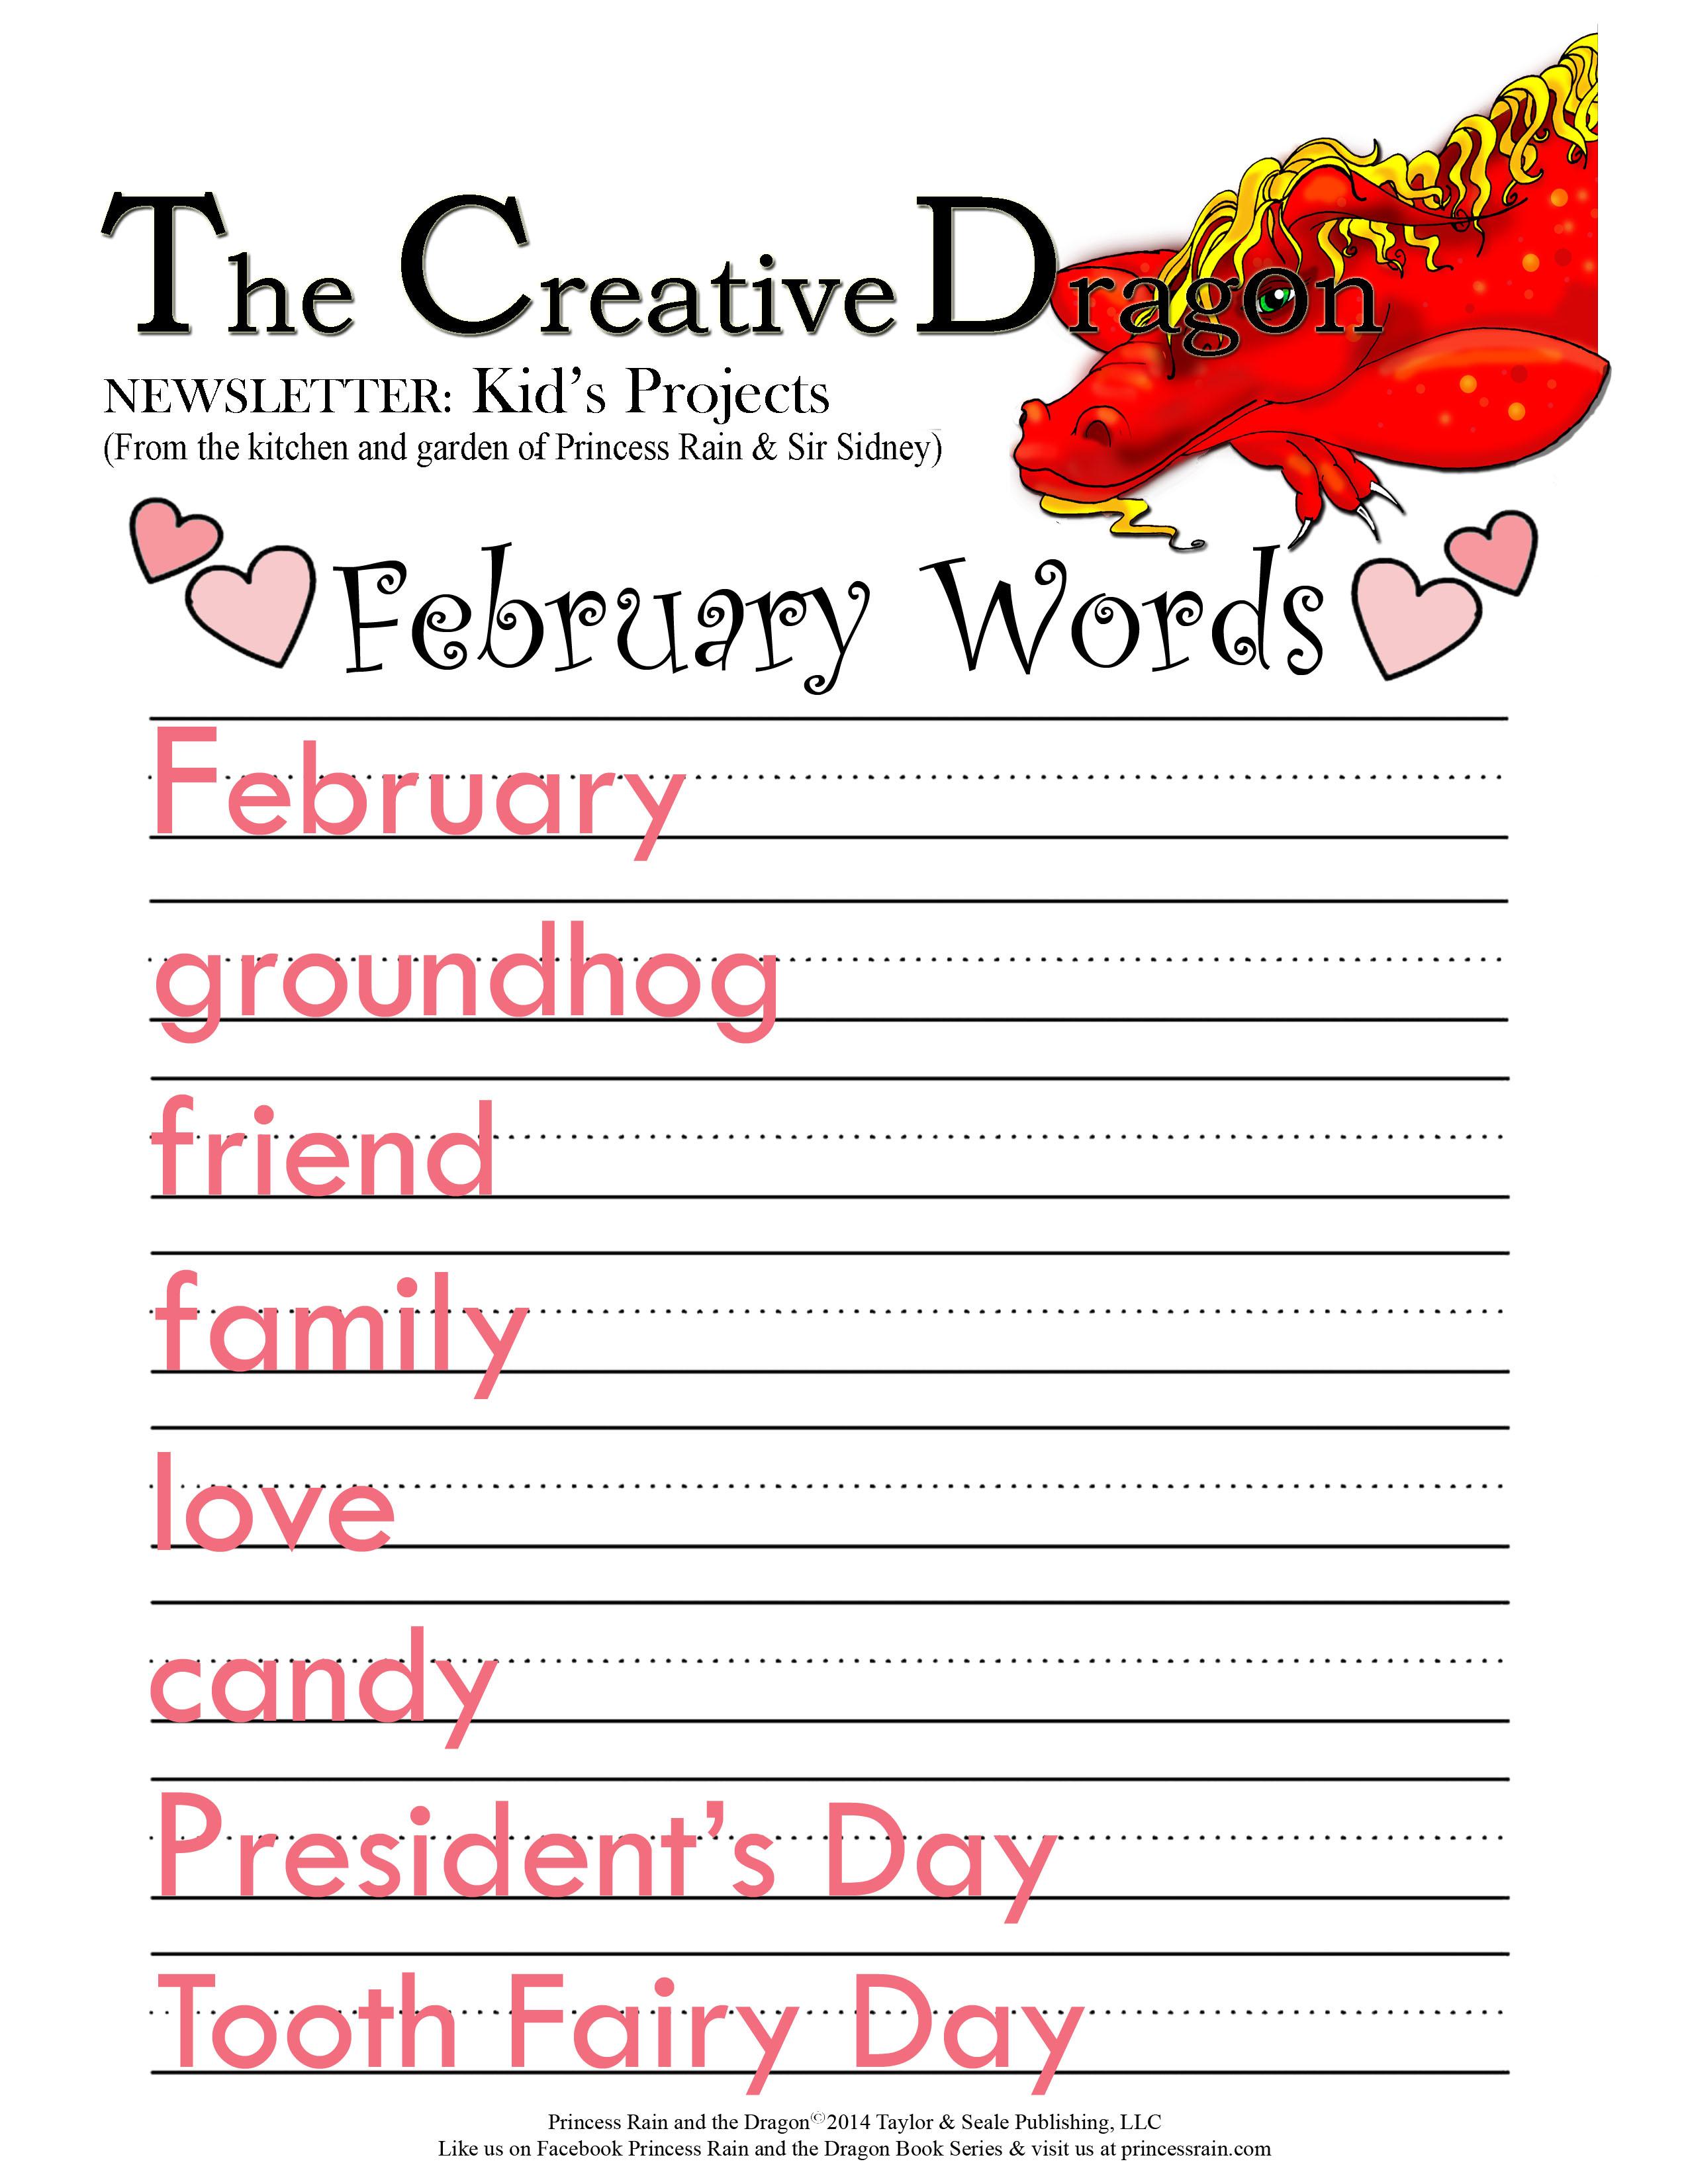 February Words Princess Rain And The Dragon